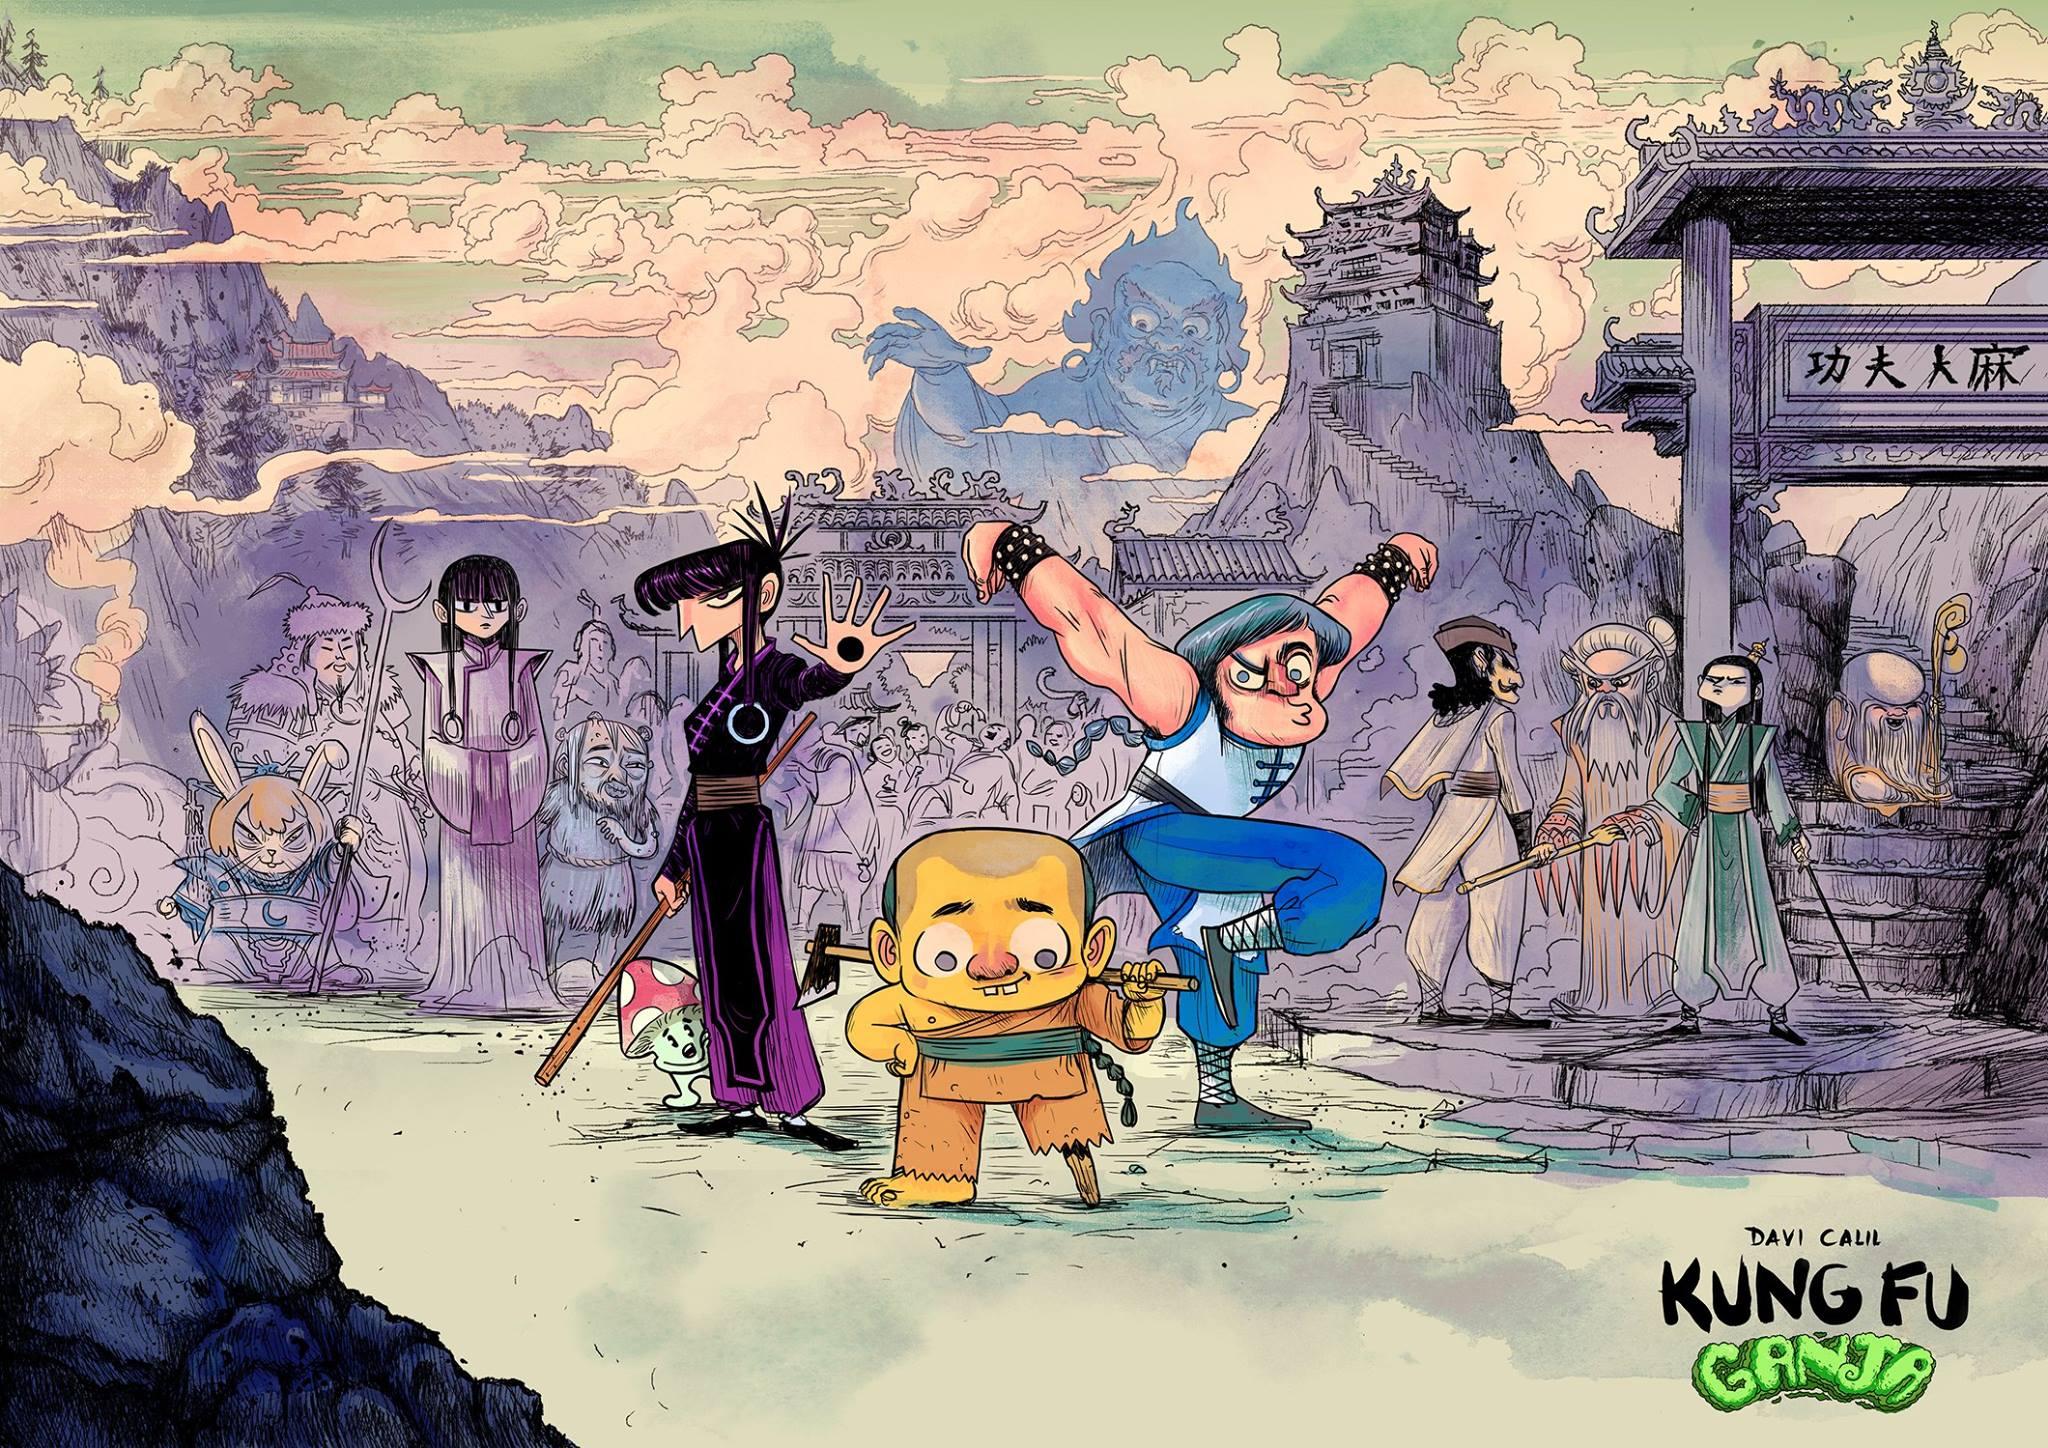 Kung Fu Ganja, por Davi Calil